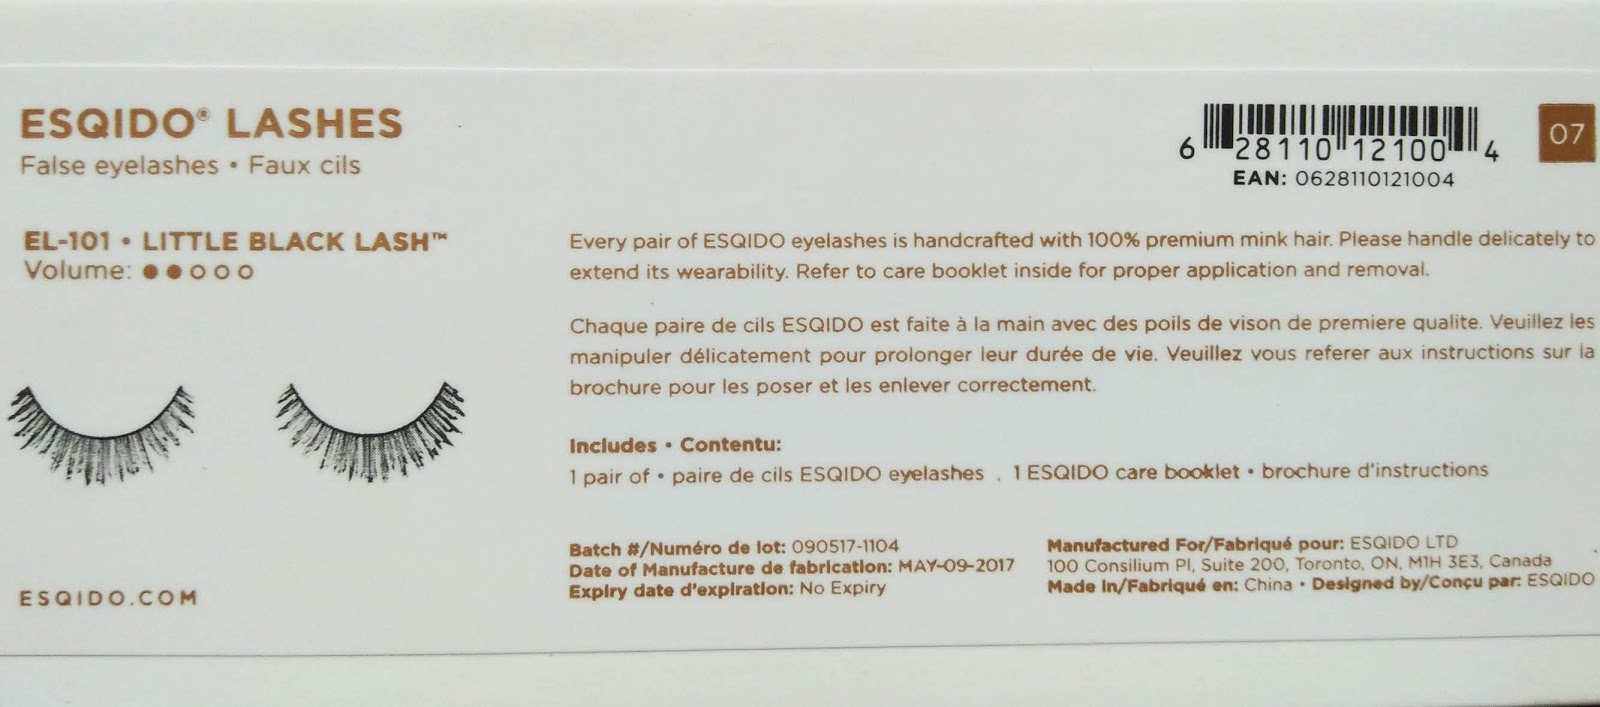 bde629f3291 Review of ESQIDO False Eyelashes #Little Black Lash and Companion ...